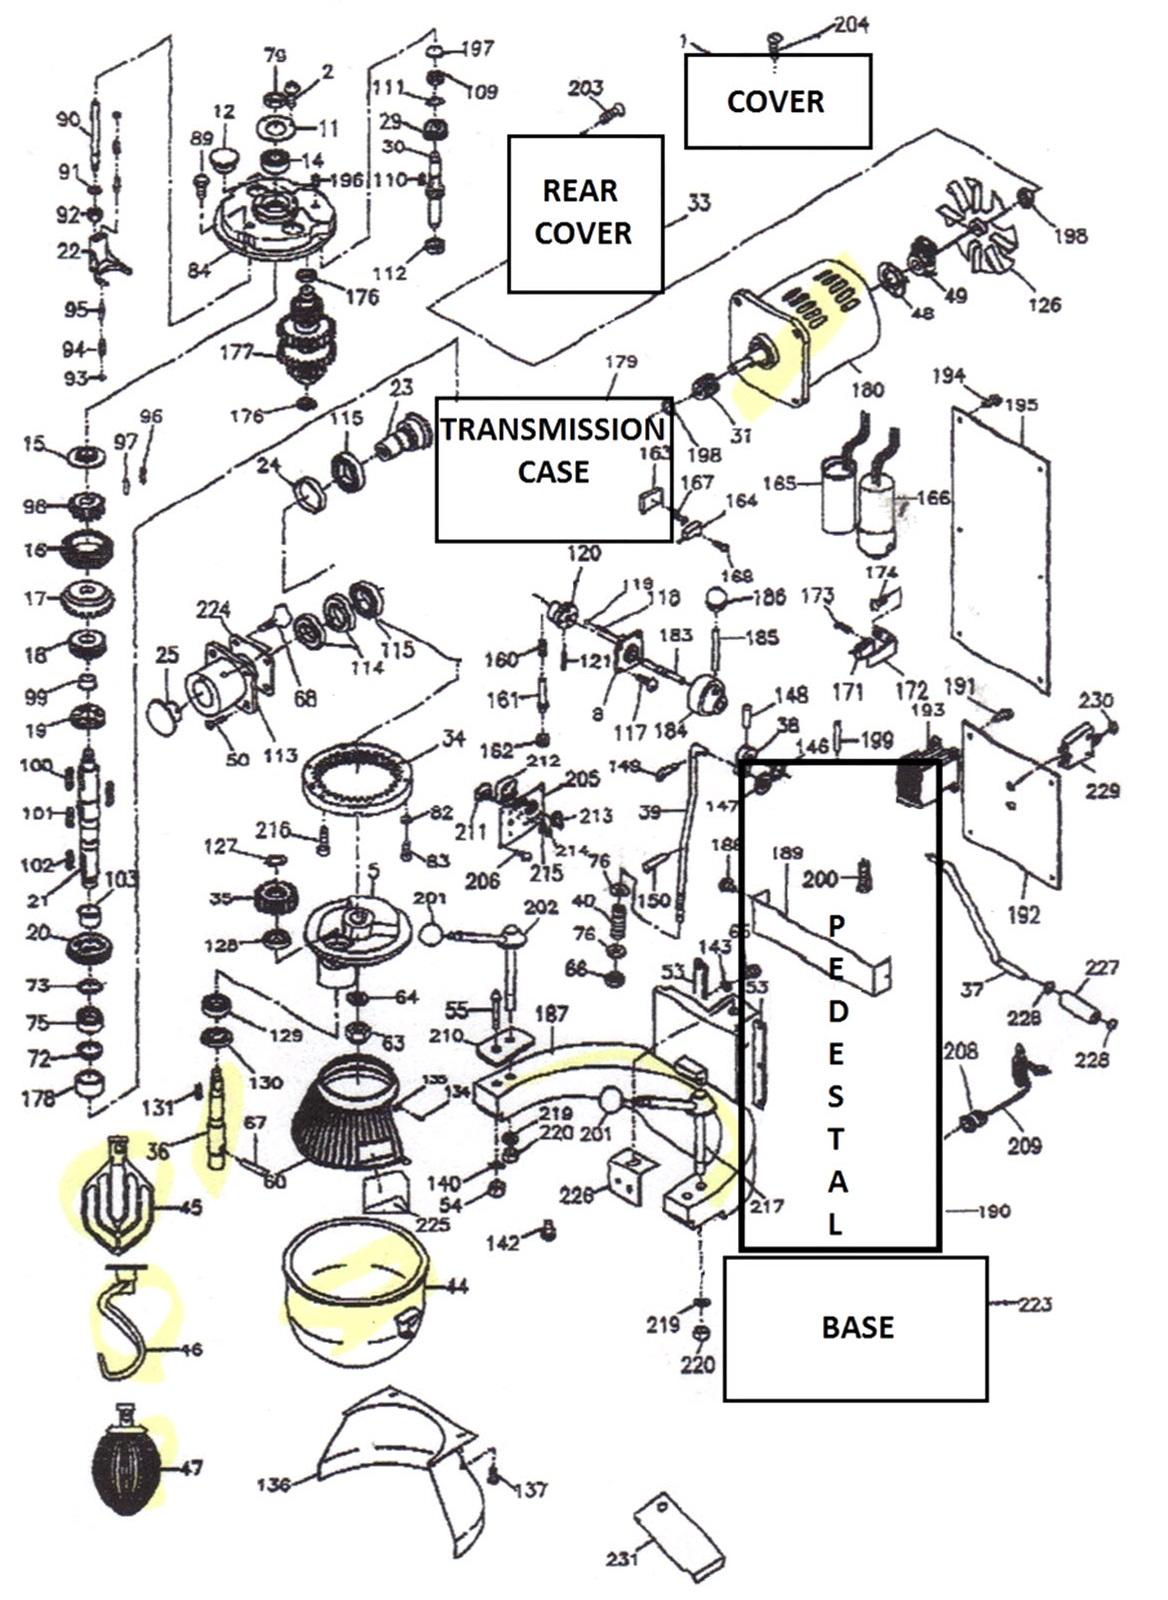 [MD_1595] Thunderbird Mixer Wiring Diagram Free Diagram